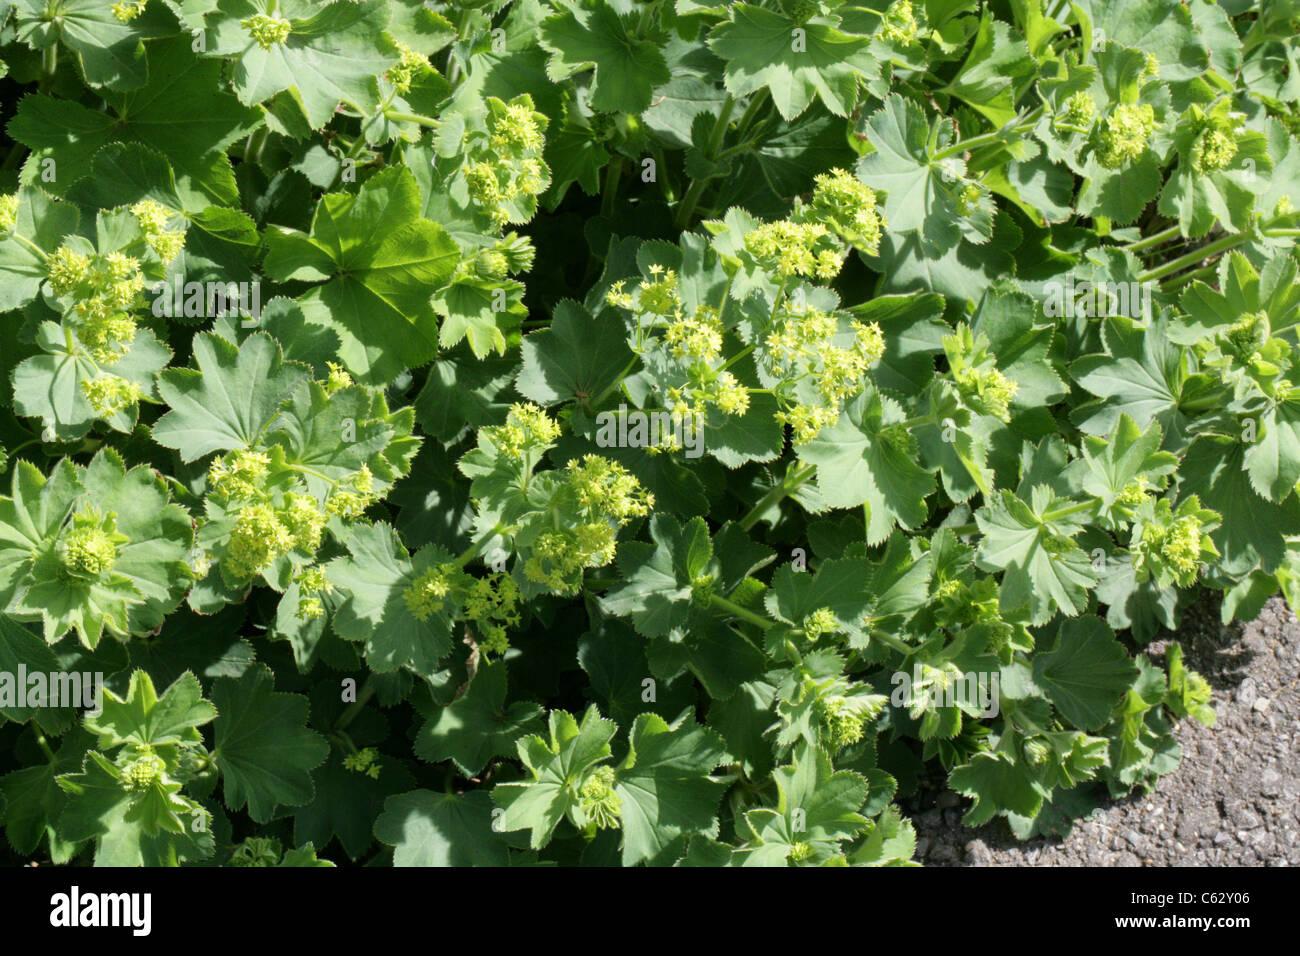 Alchemilla aroanica, Rosaceae. Greece. - Stock Image